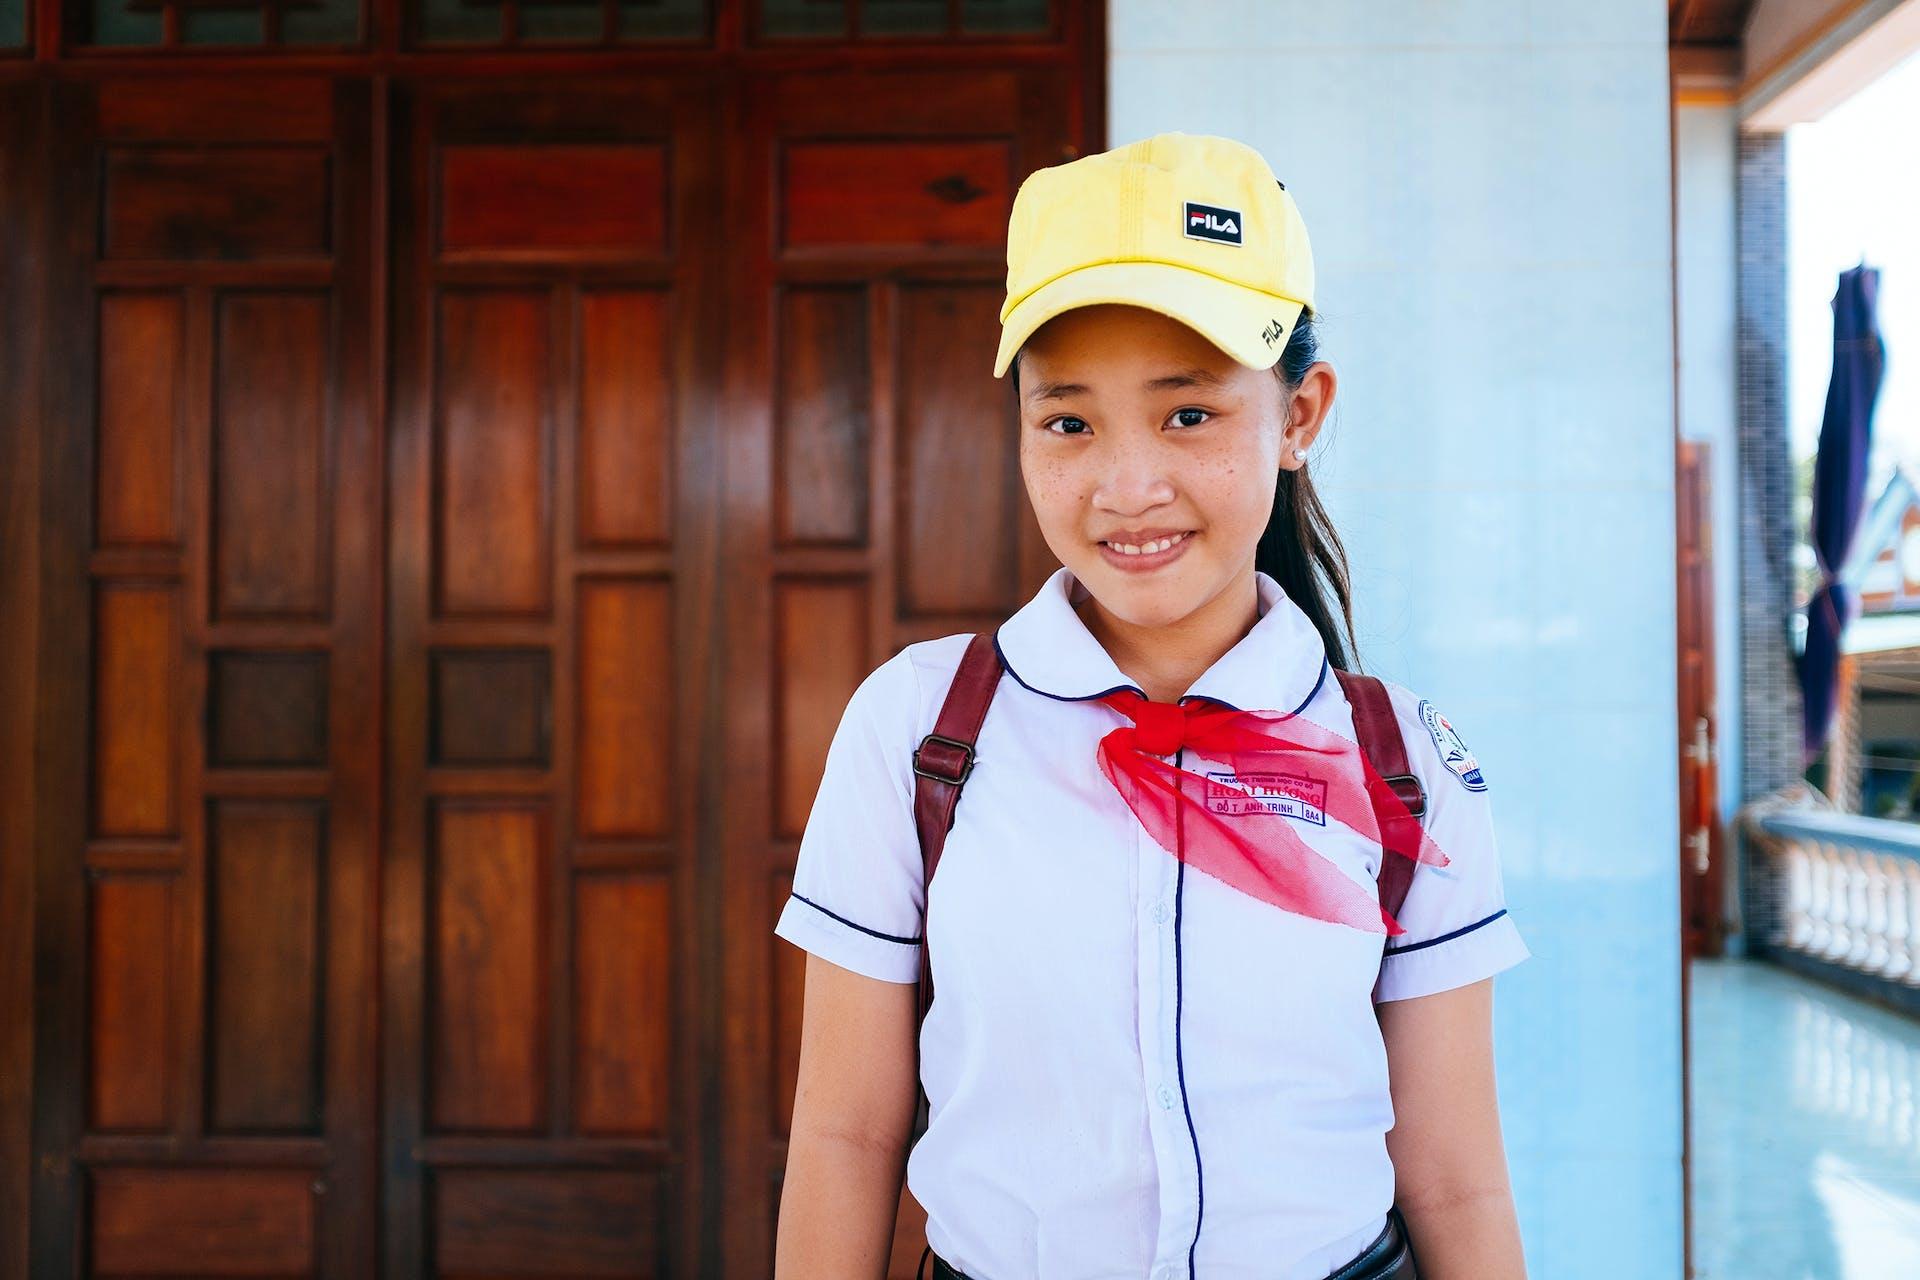 Strabismus patient Trinh, Vietnam, in her school uniform